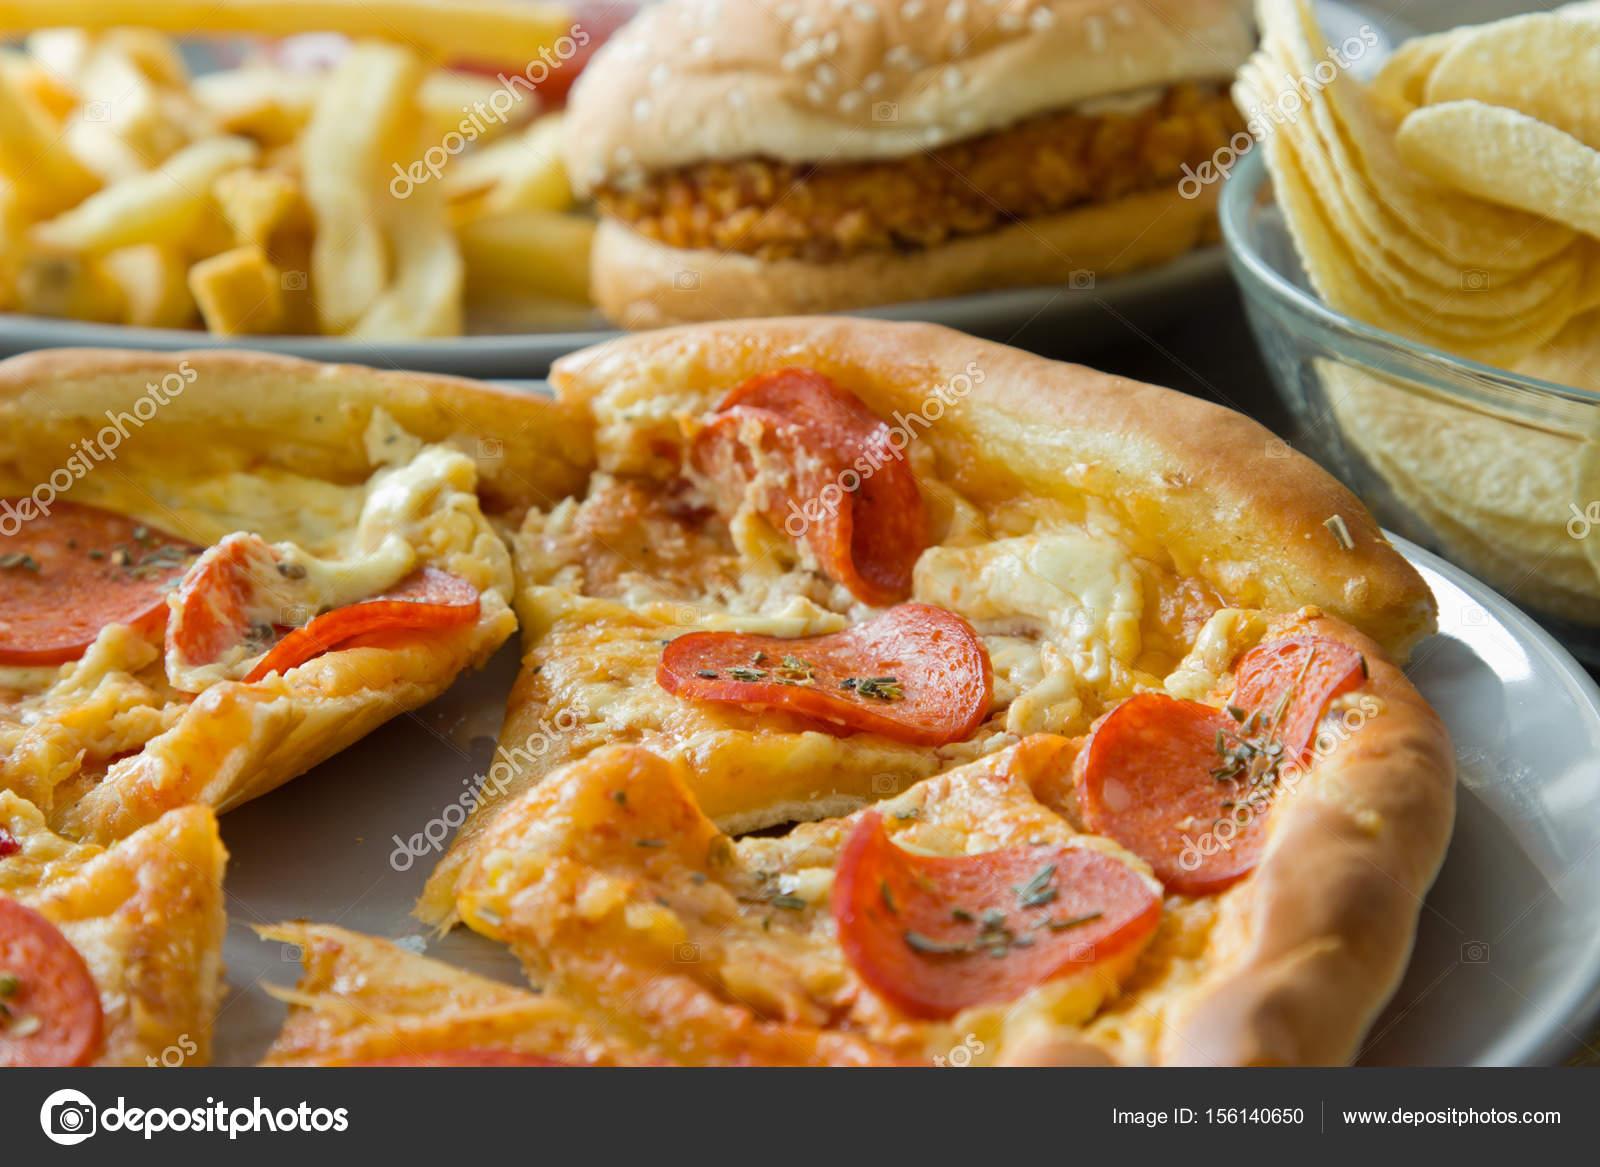 Unhealthy concept  unhealthy food: Burger, sauce, potatoes, pizz